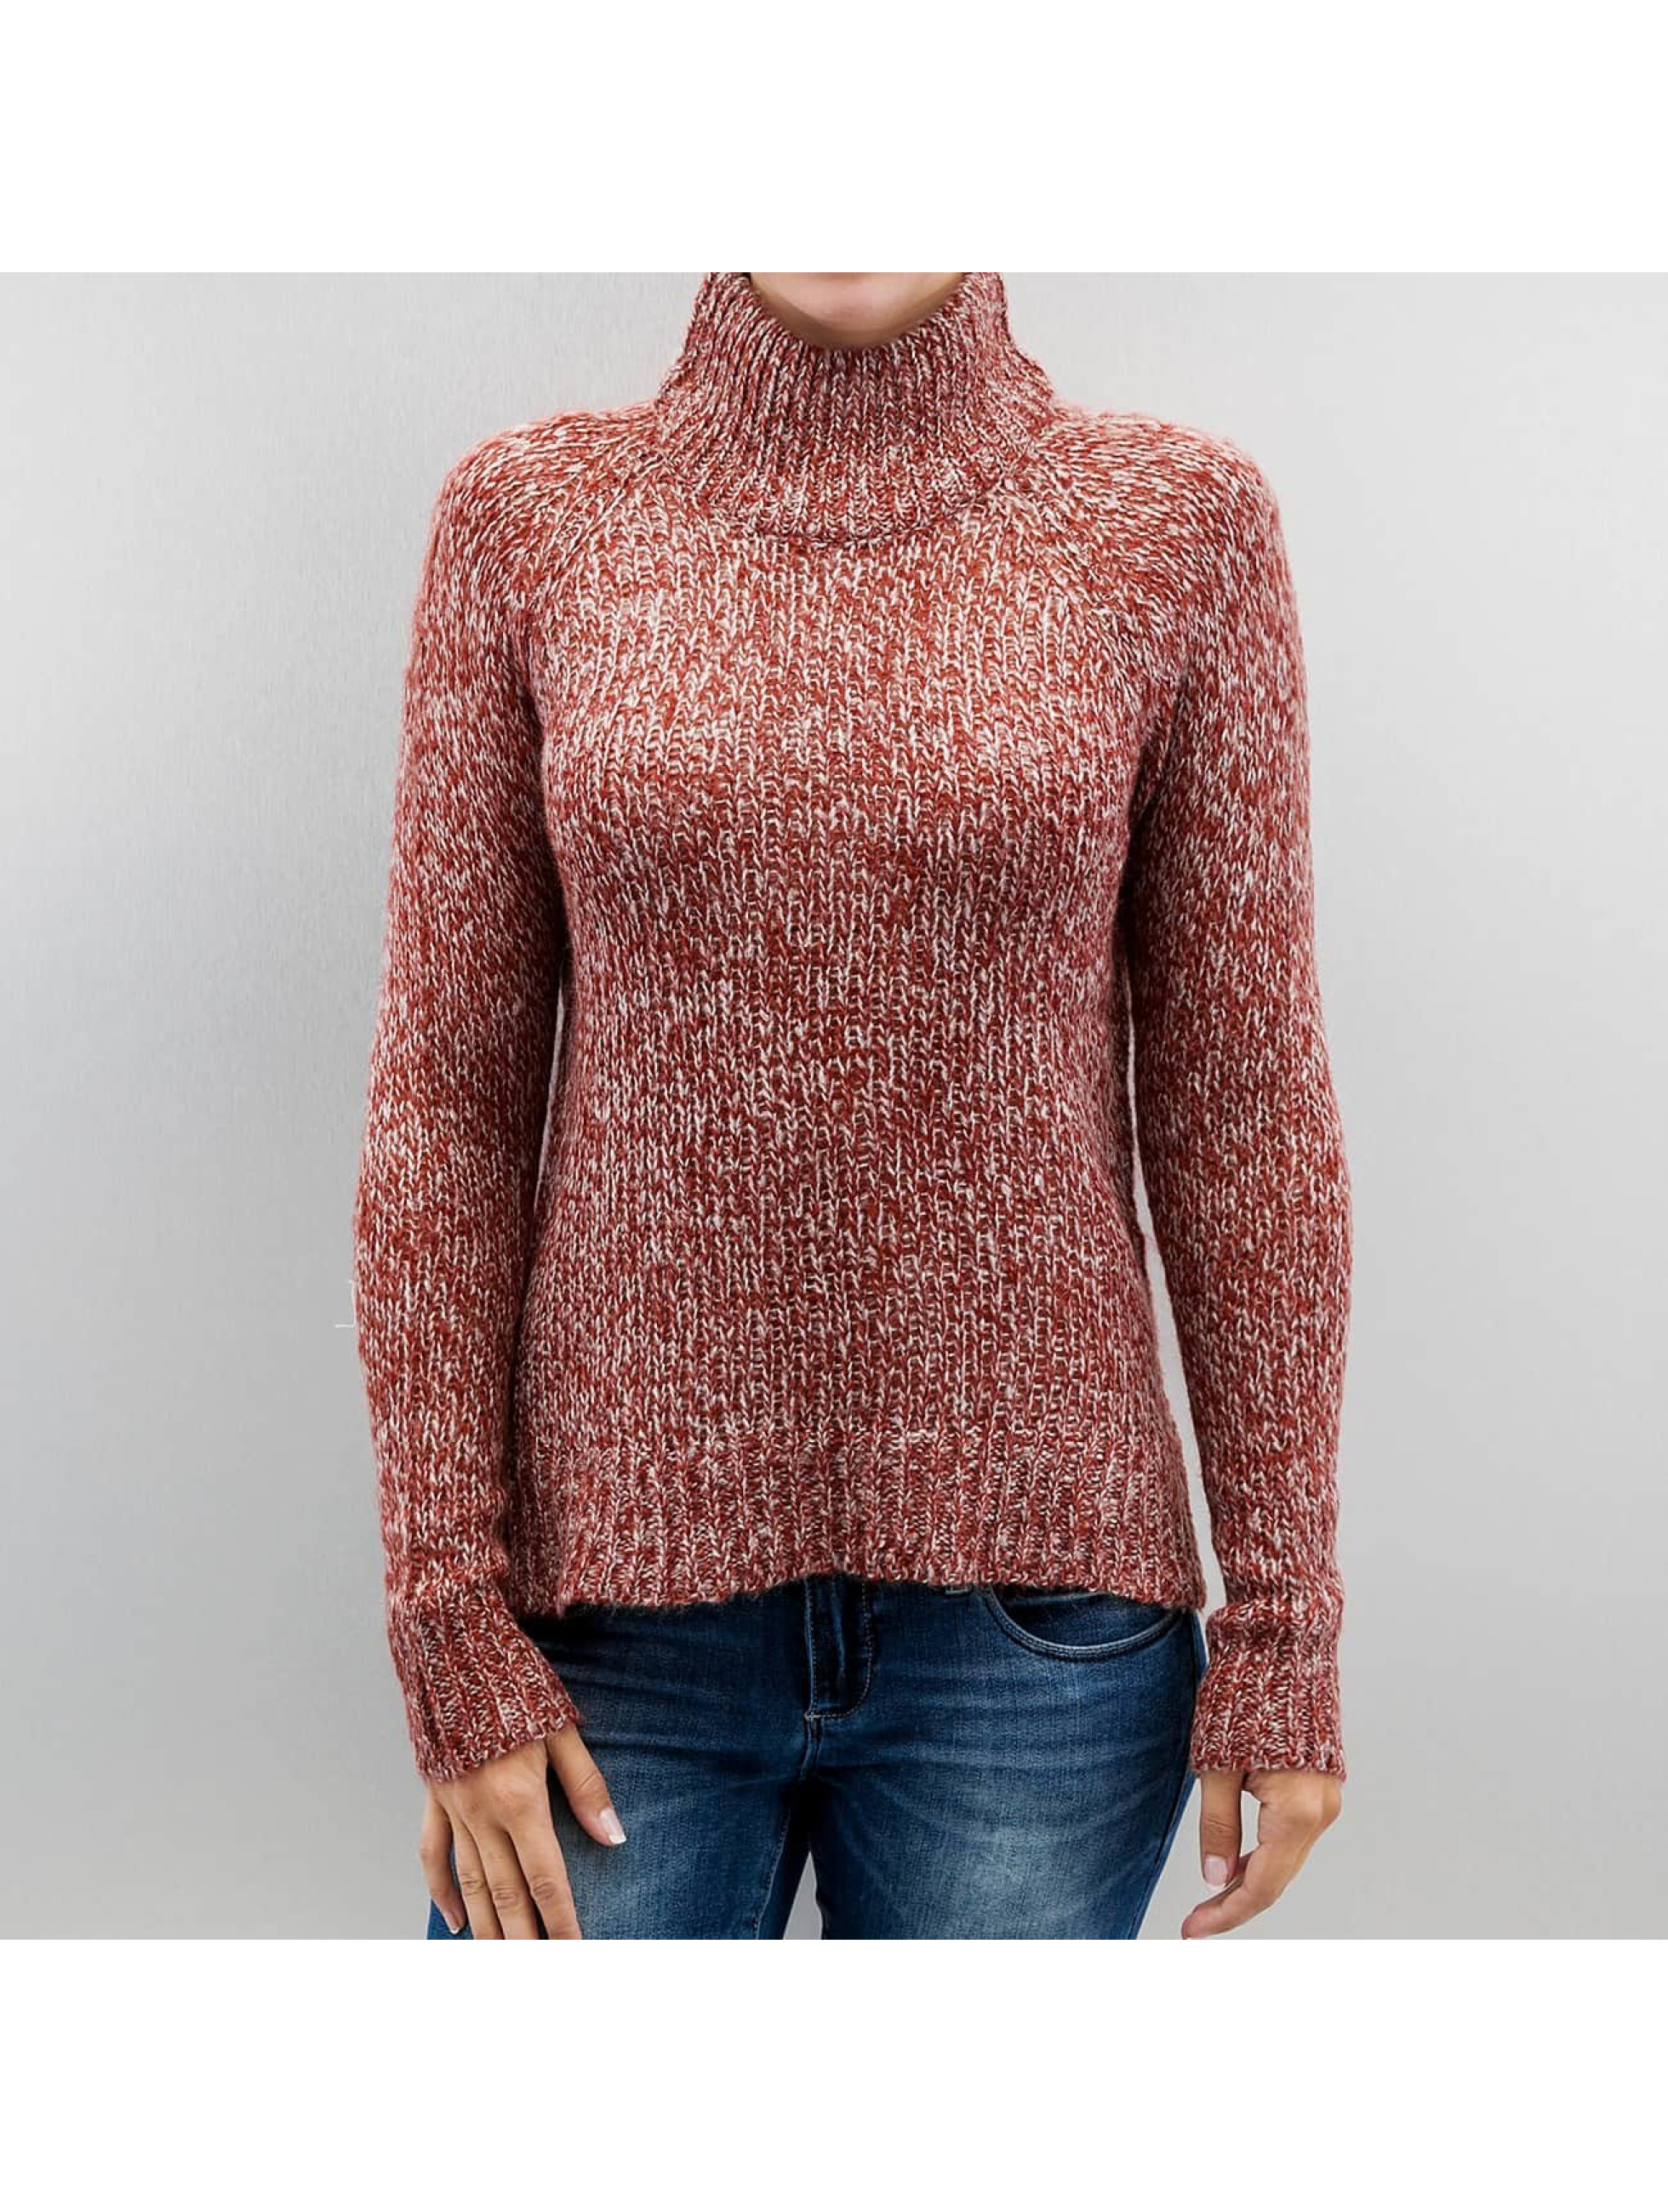 Vero Moda trui vmCamille rood